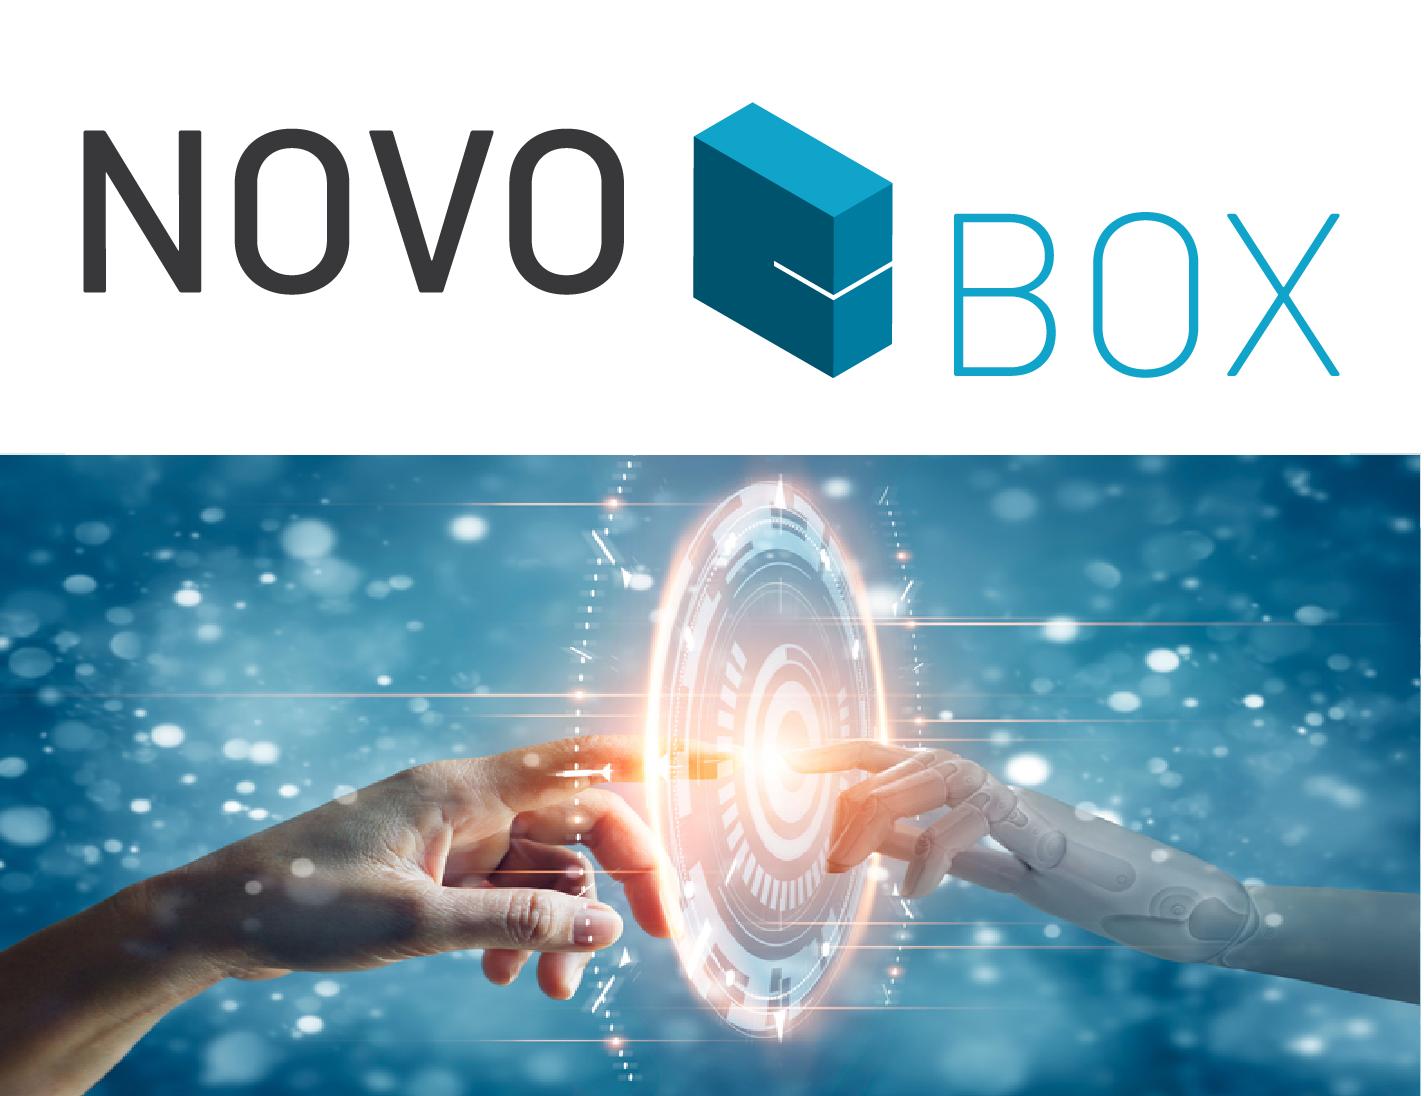 NOVO BOX